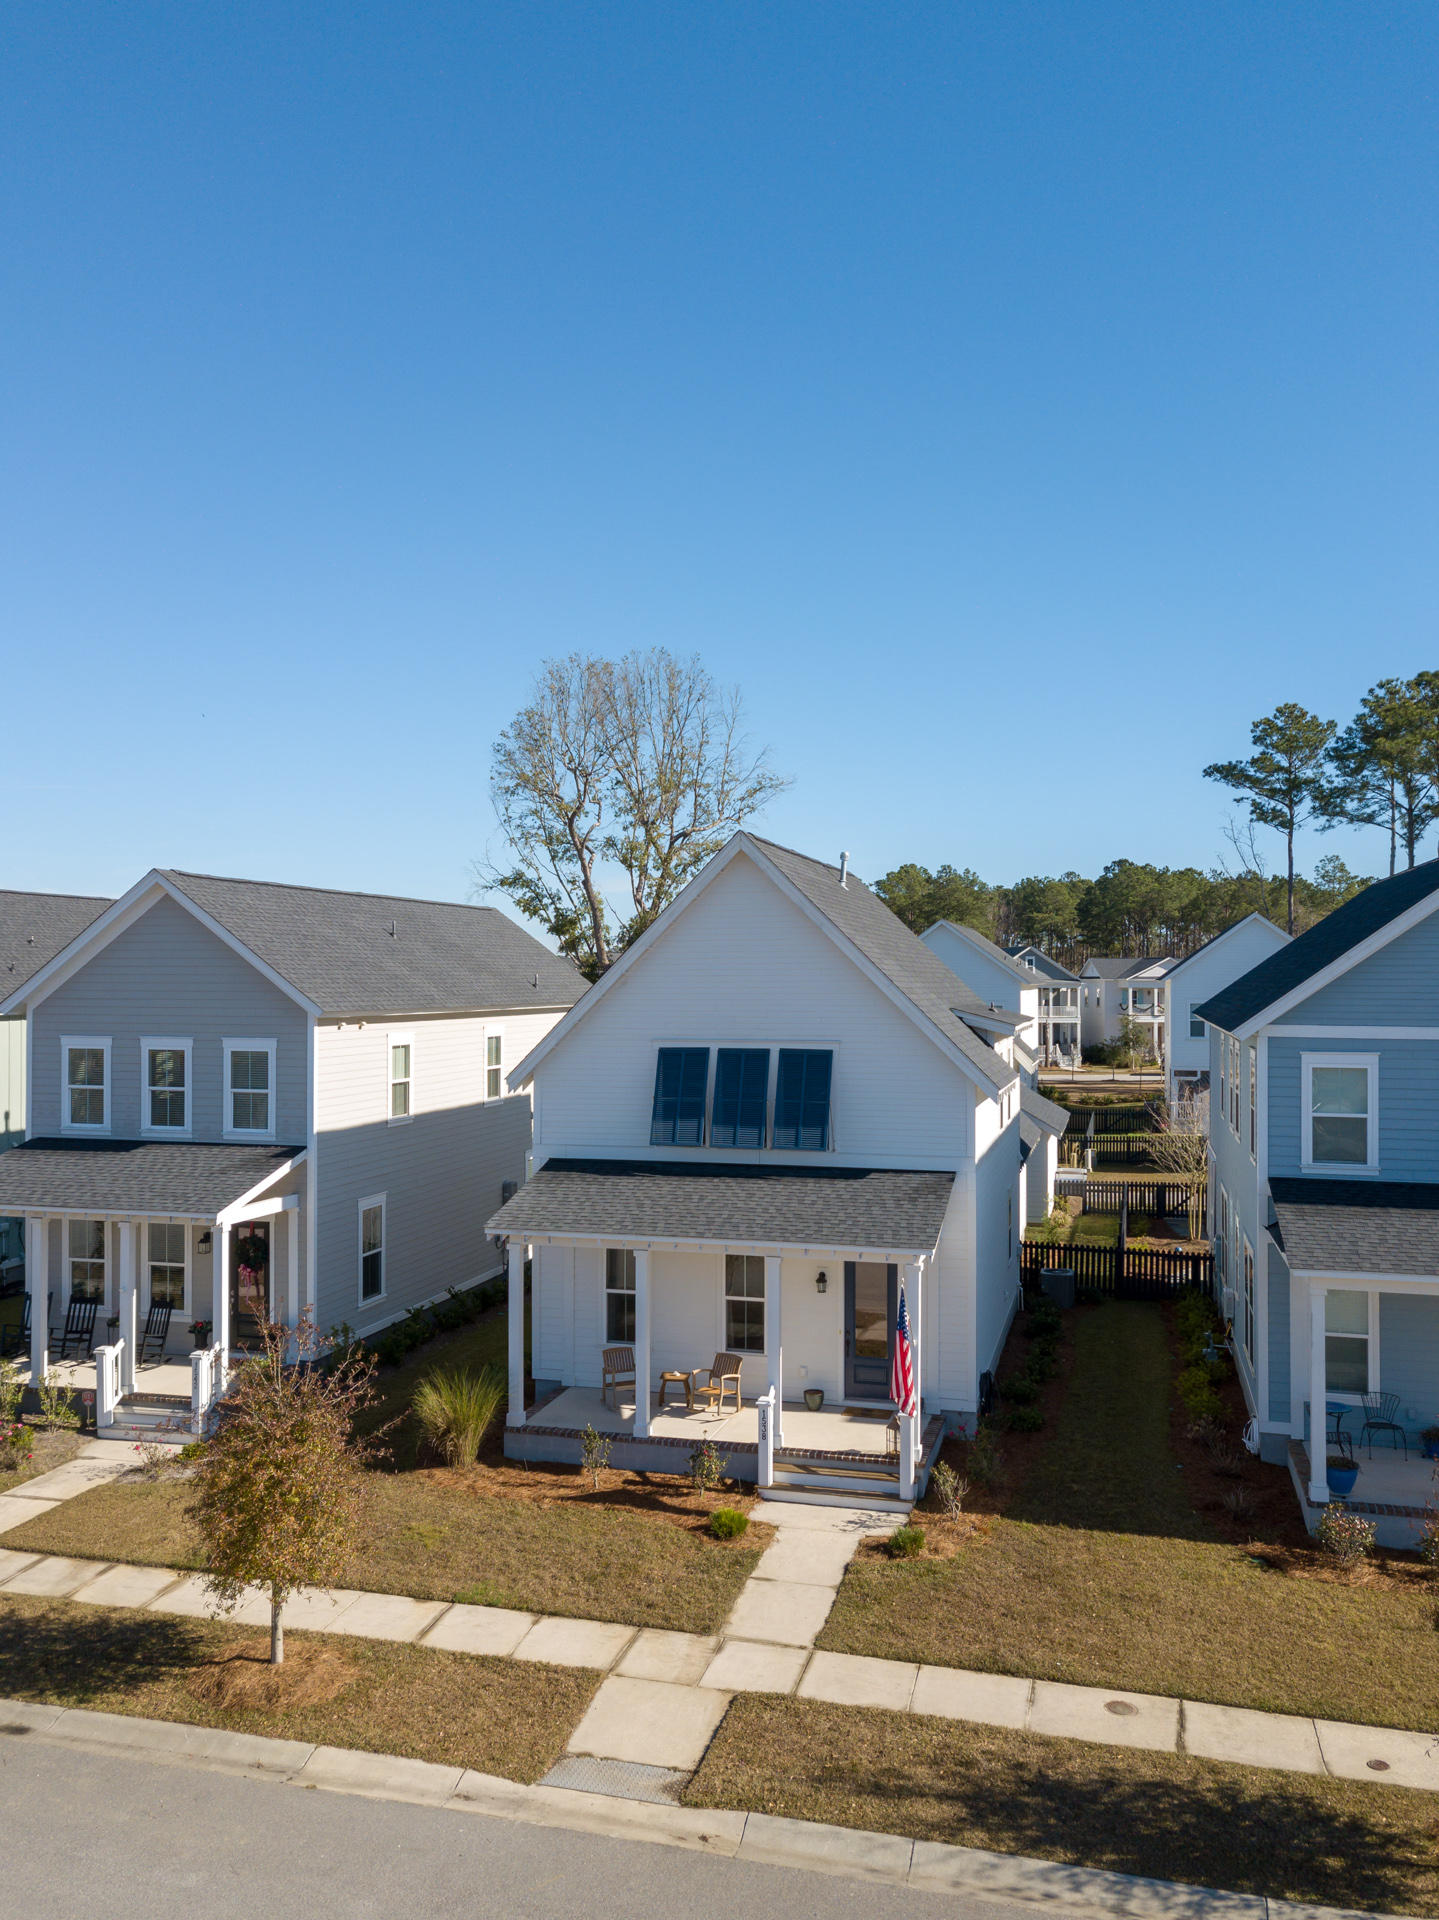 Carolina Park Homes For Sale - 1538 Watt Pond, Mount Pleasant, SC - 0